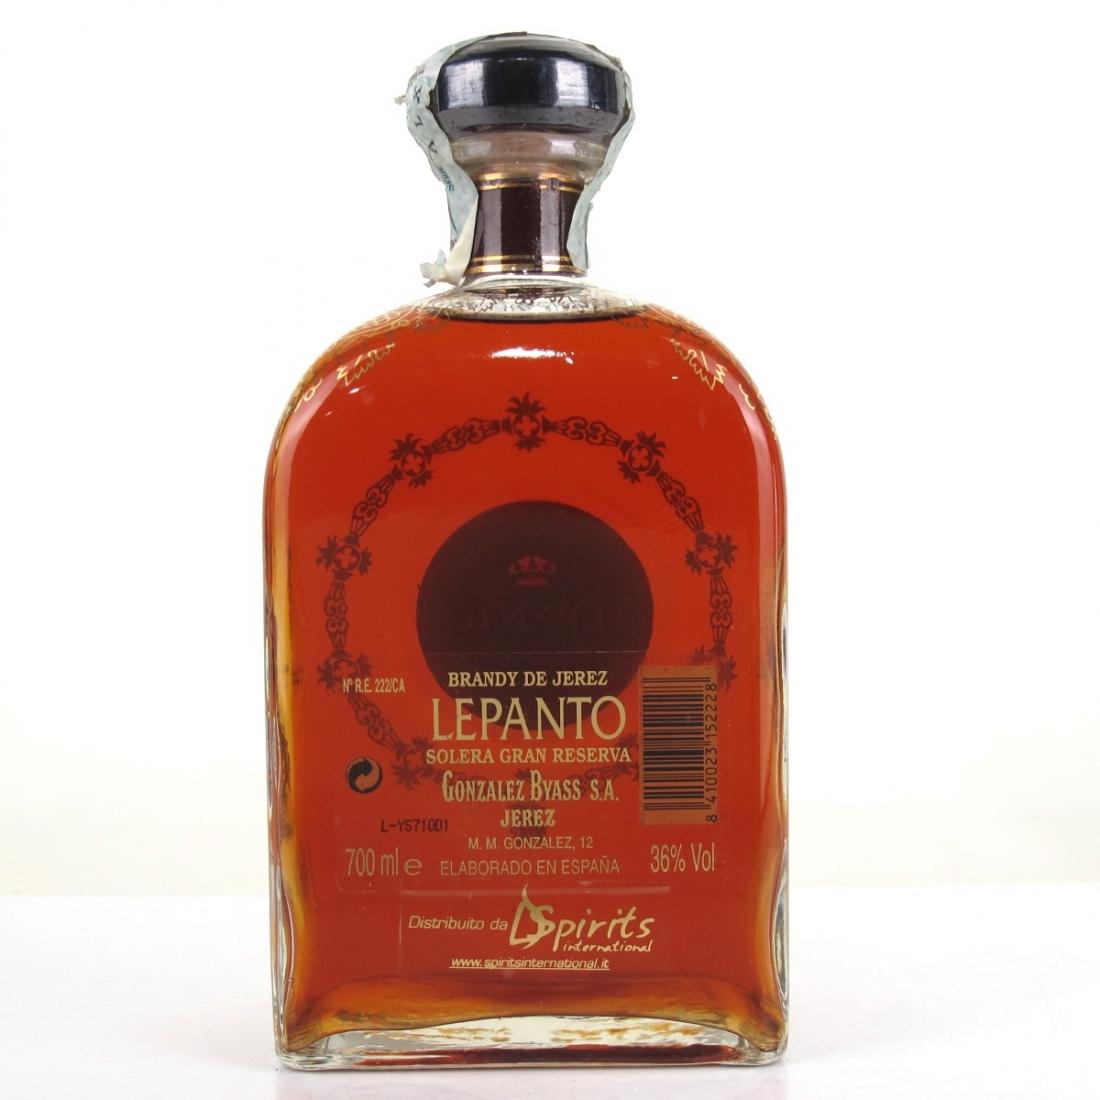 Lepanto Gonzalez Byass Brandy